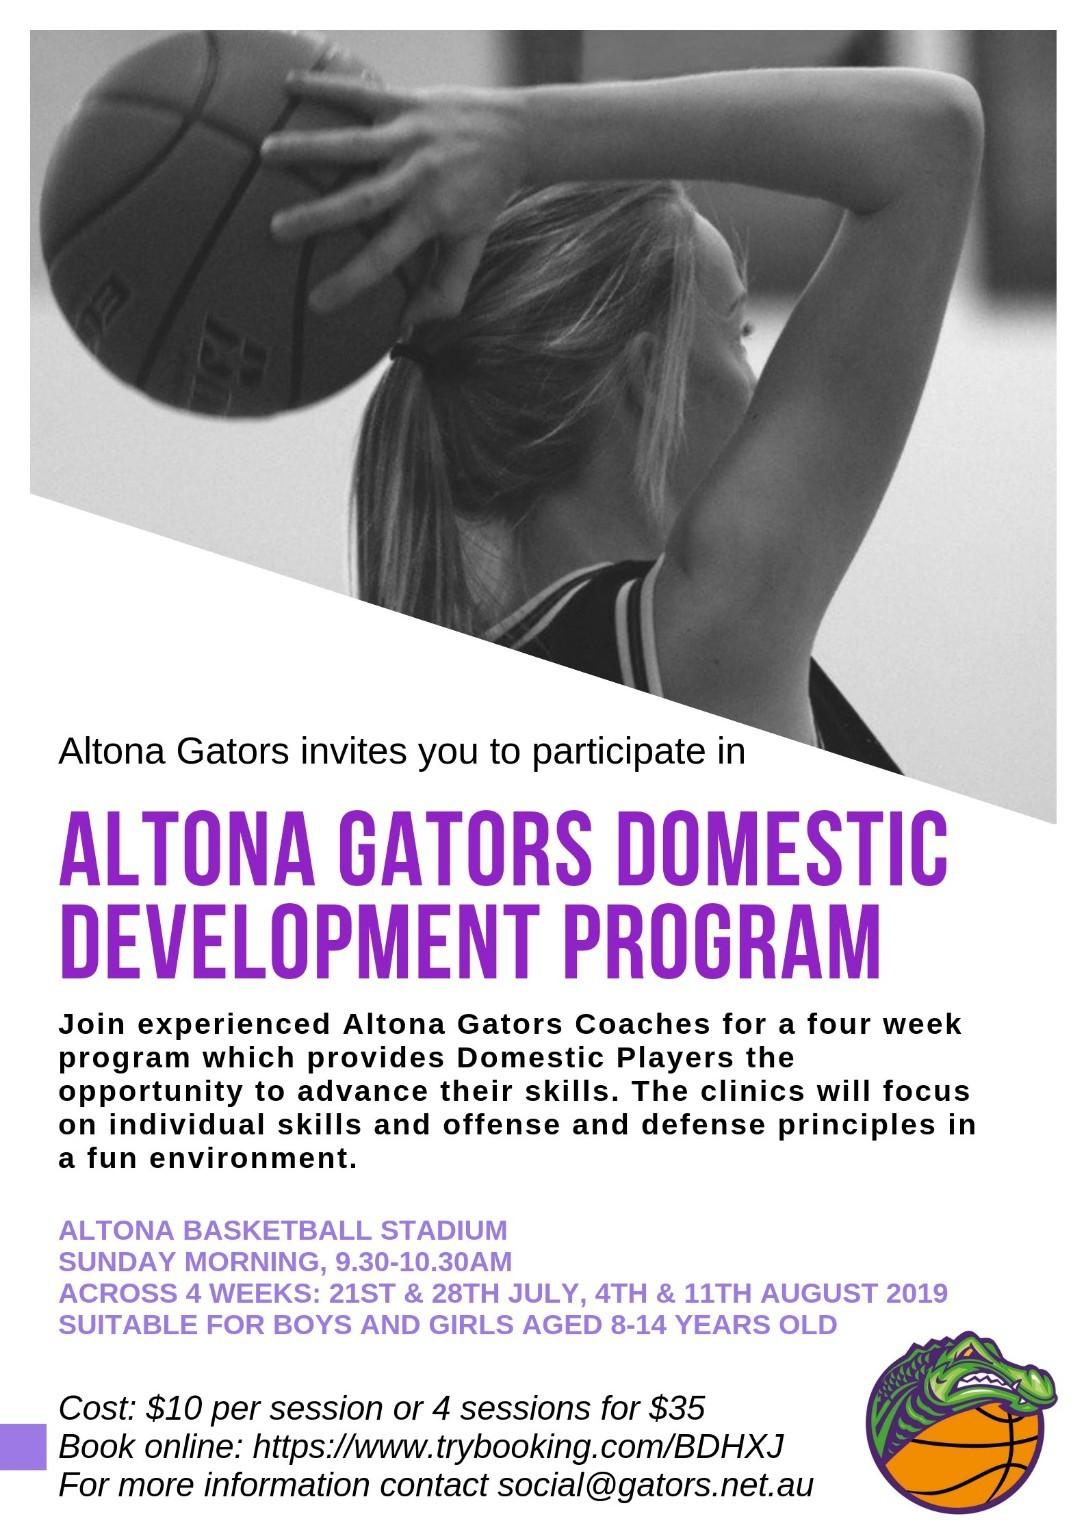 Altona Gators Domestic Development Program